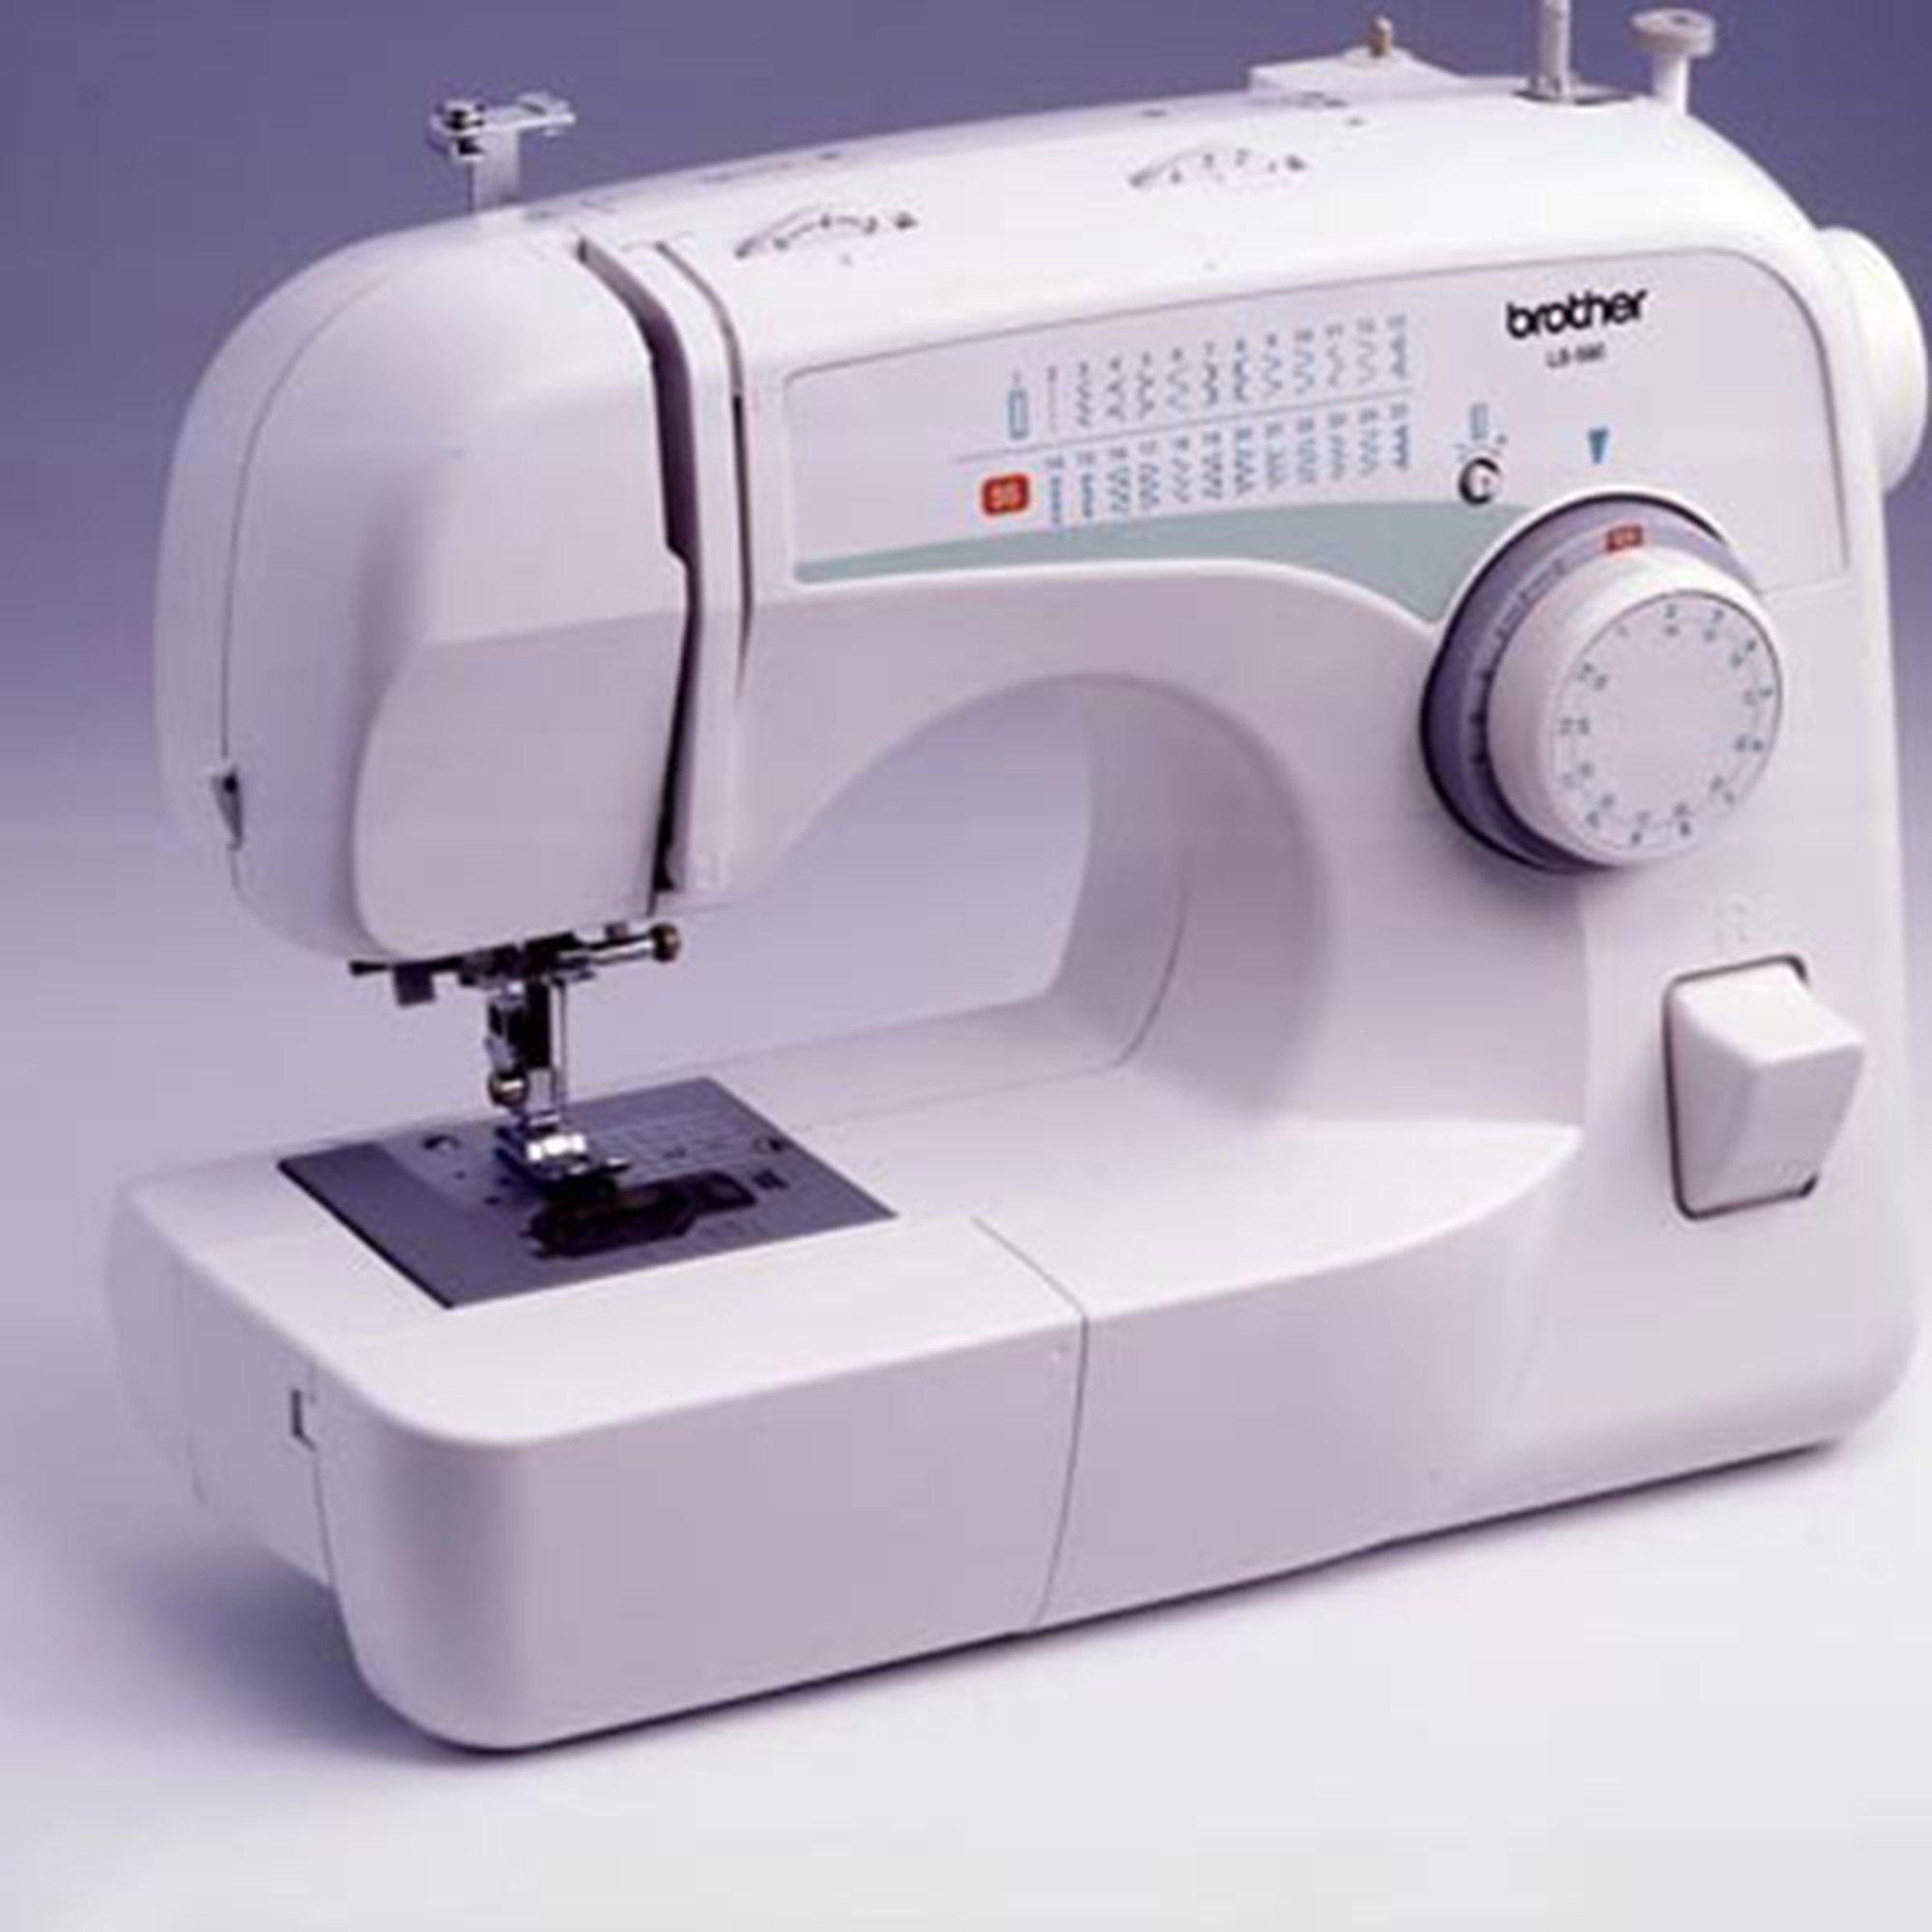 sewing machine ls 590